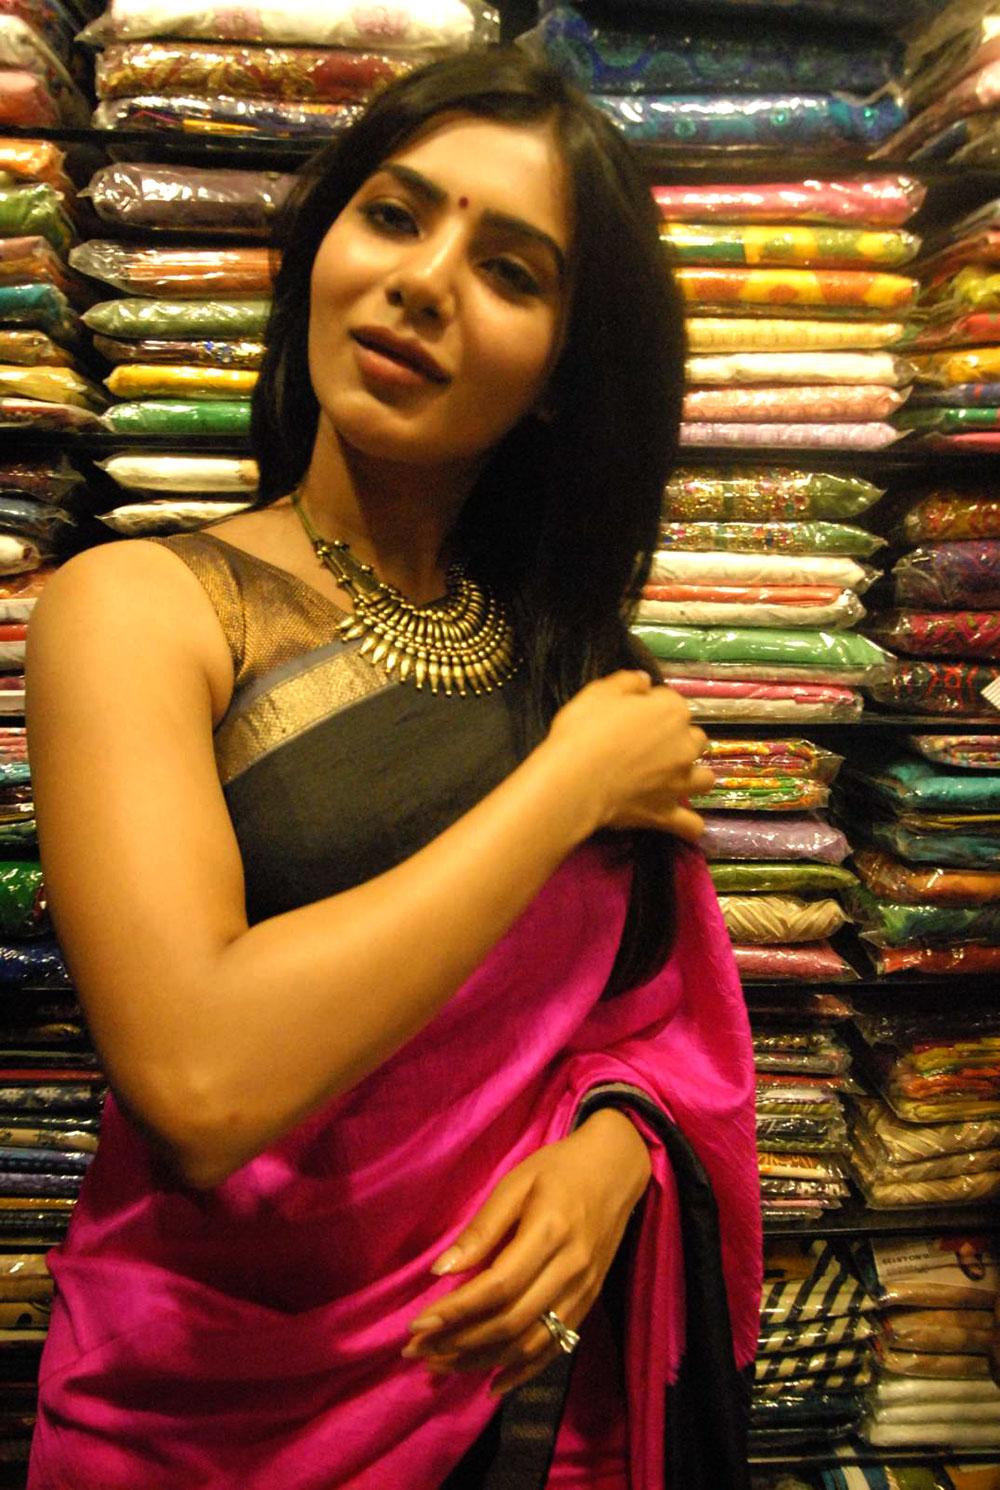 Gorgeous hot sexy Samantha in purple sareee latest pics at anutex launch at as rao nagar